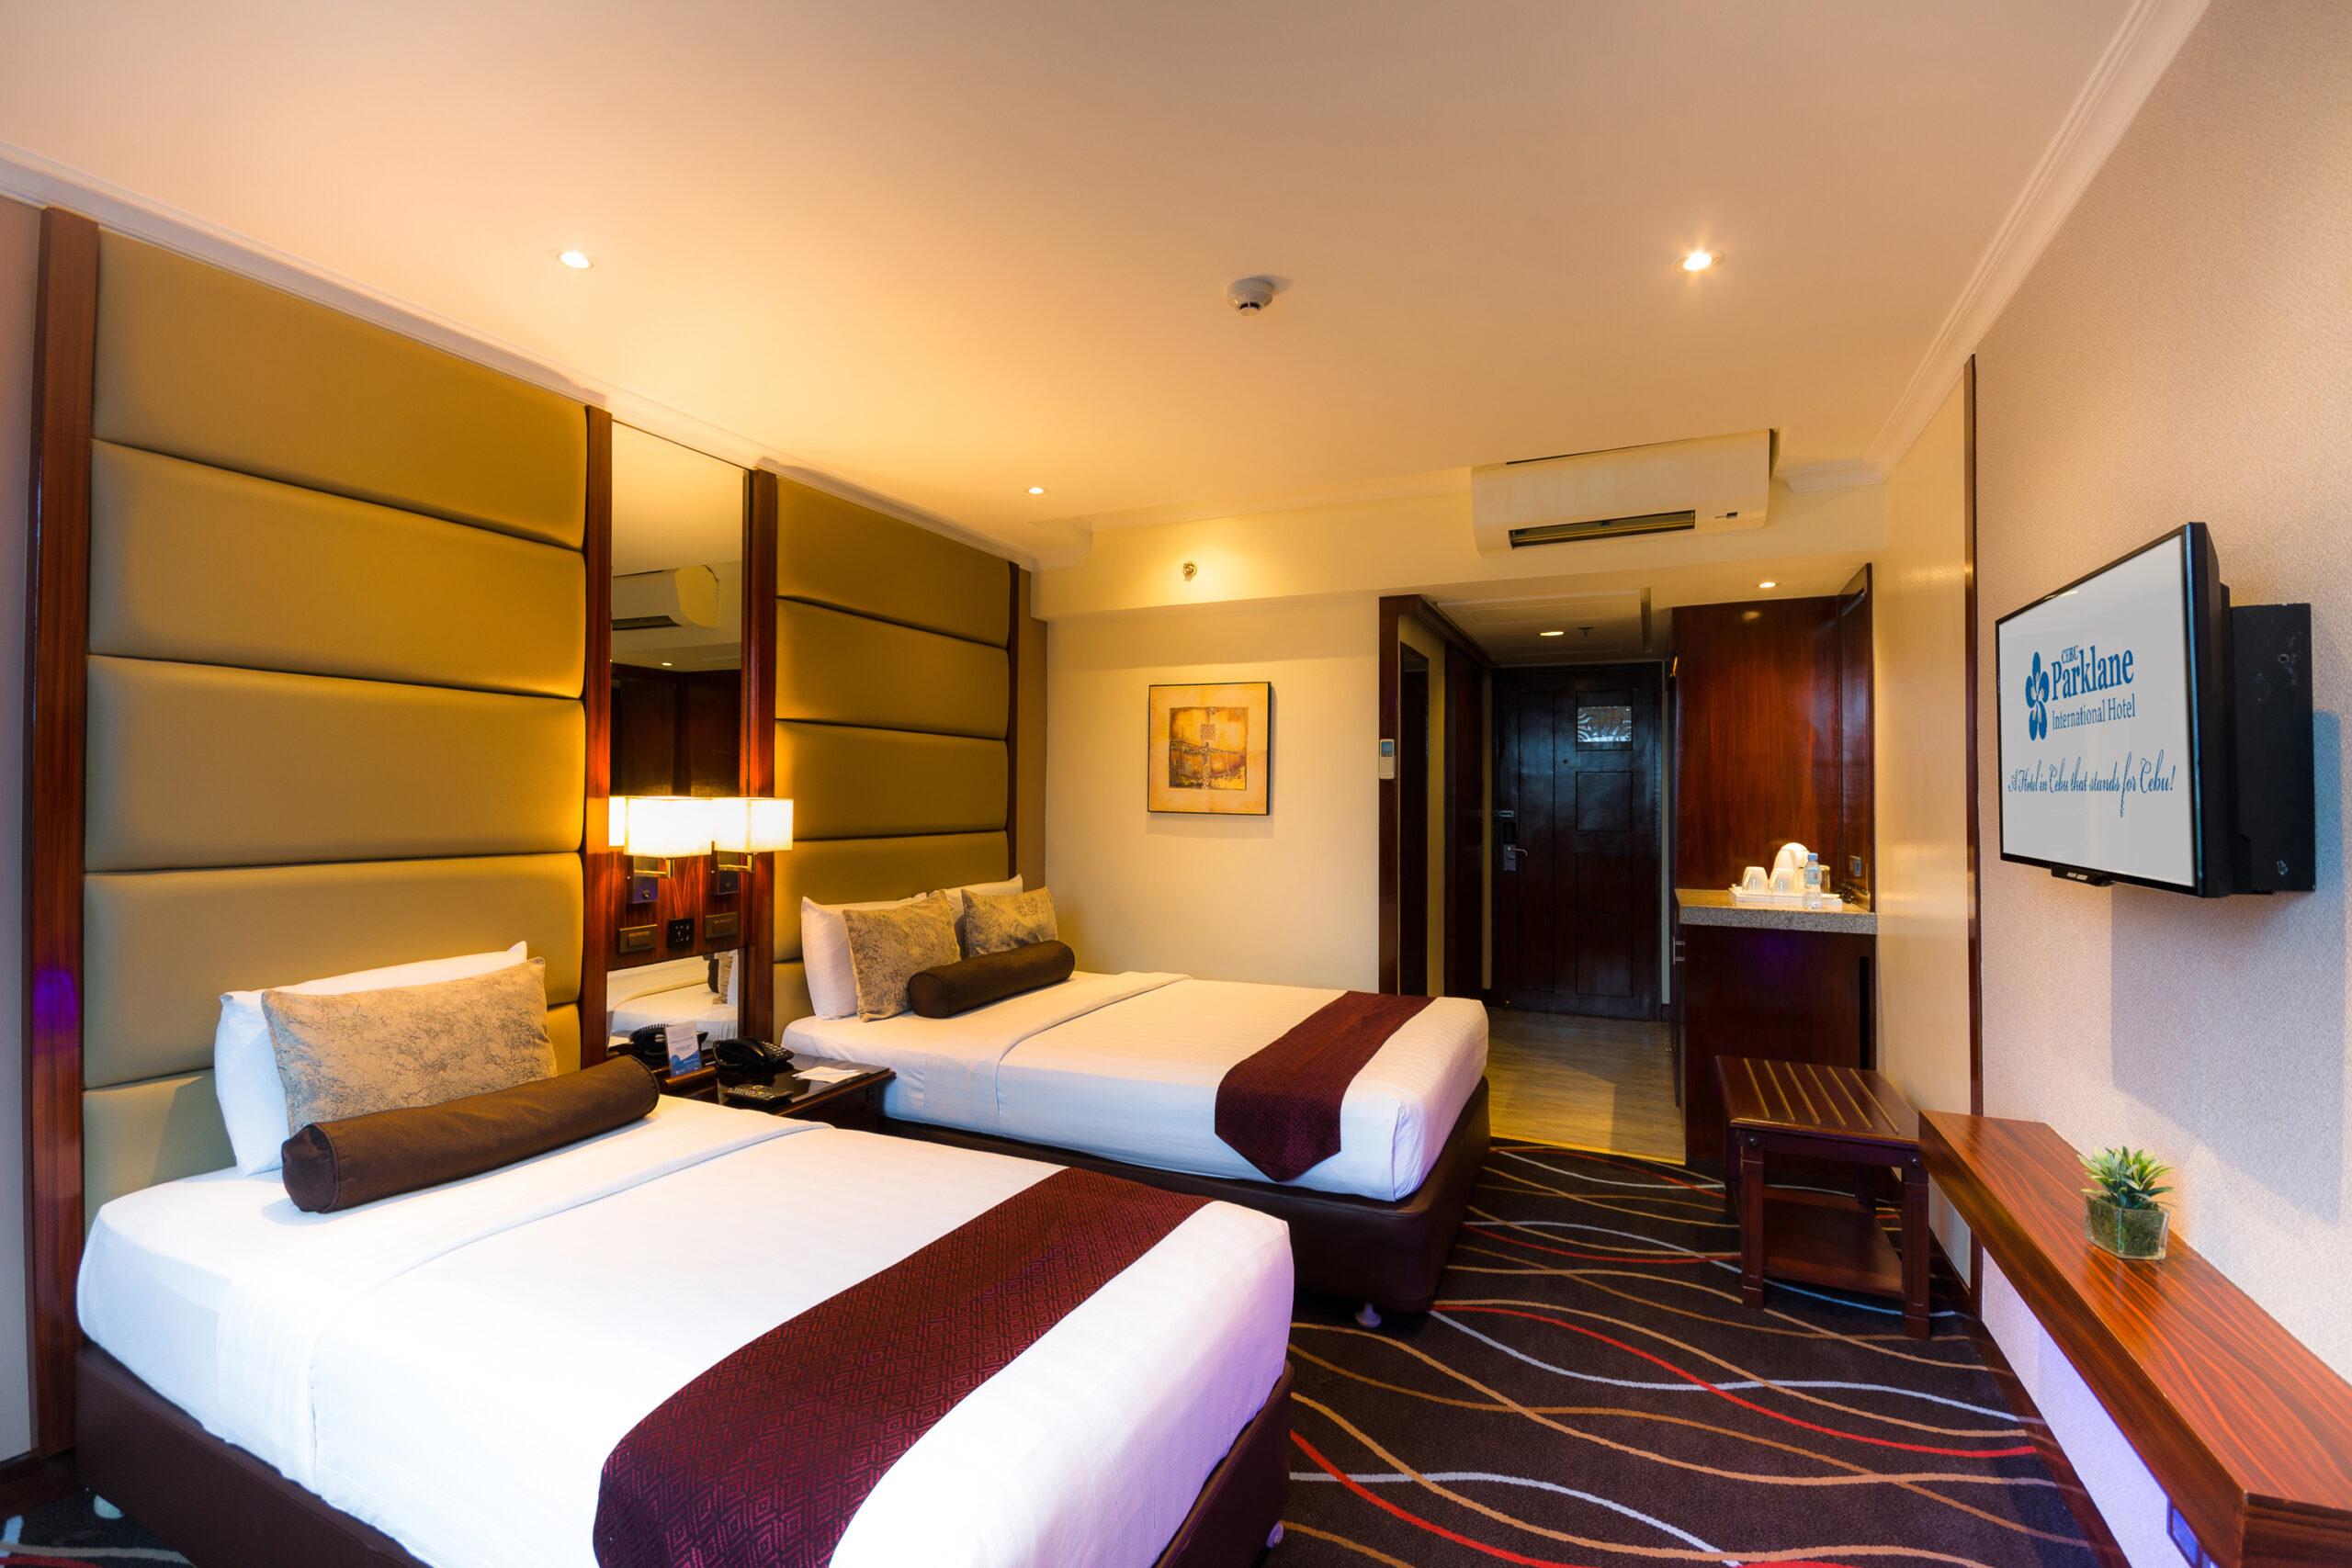 Cebu Parklane International Hotel offers 40% discount on rooms